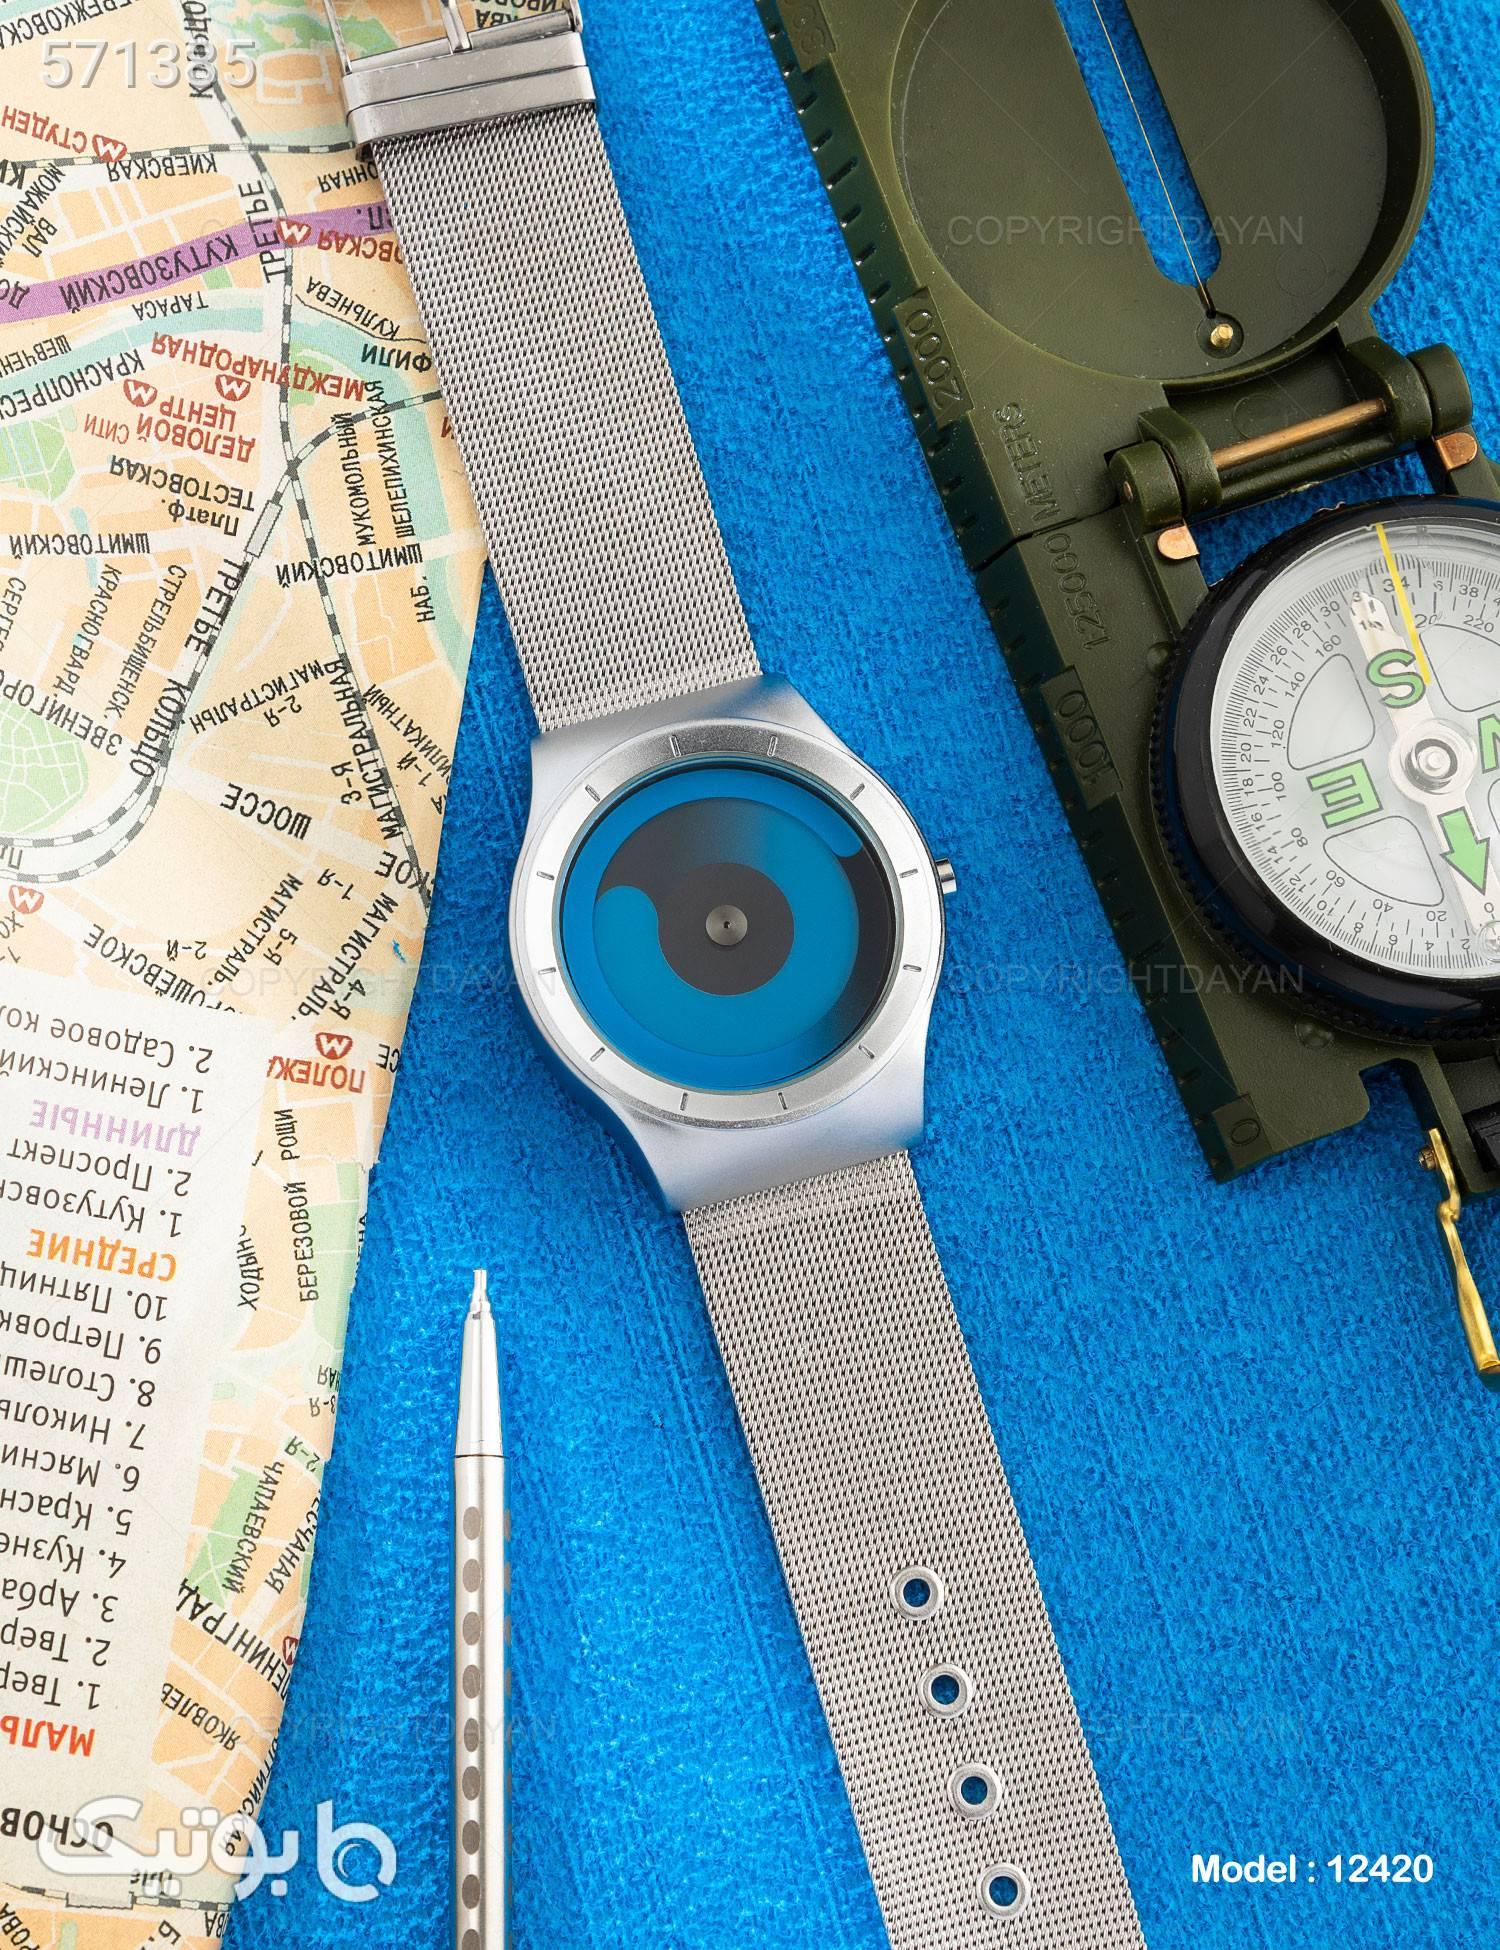 ساعت مچی  Libo مدل 12420 آبی ساعت